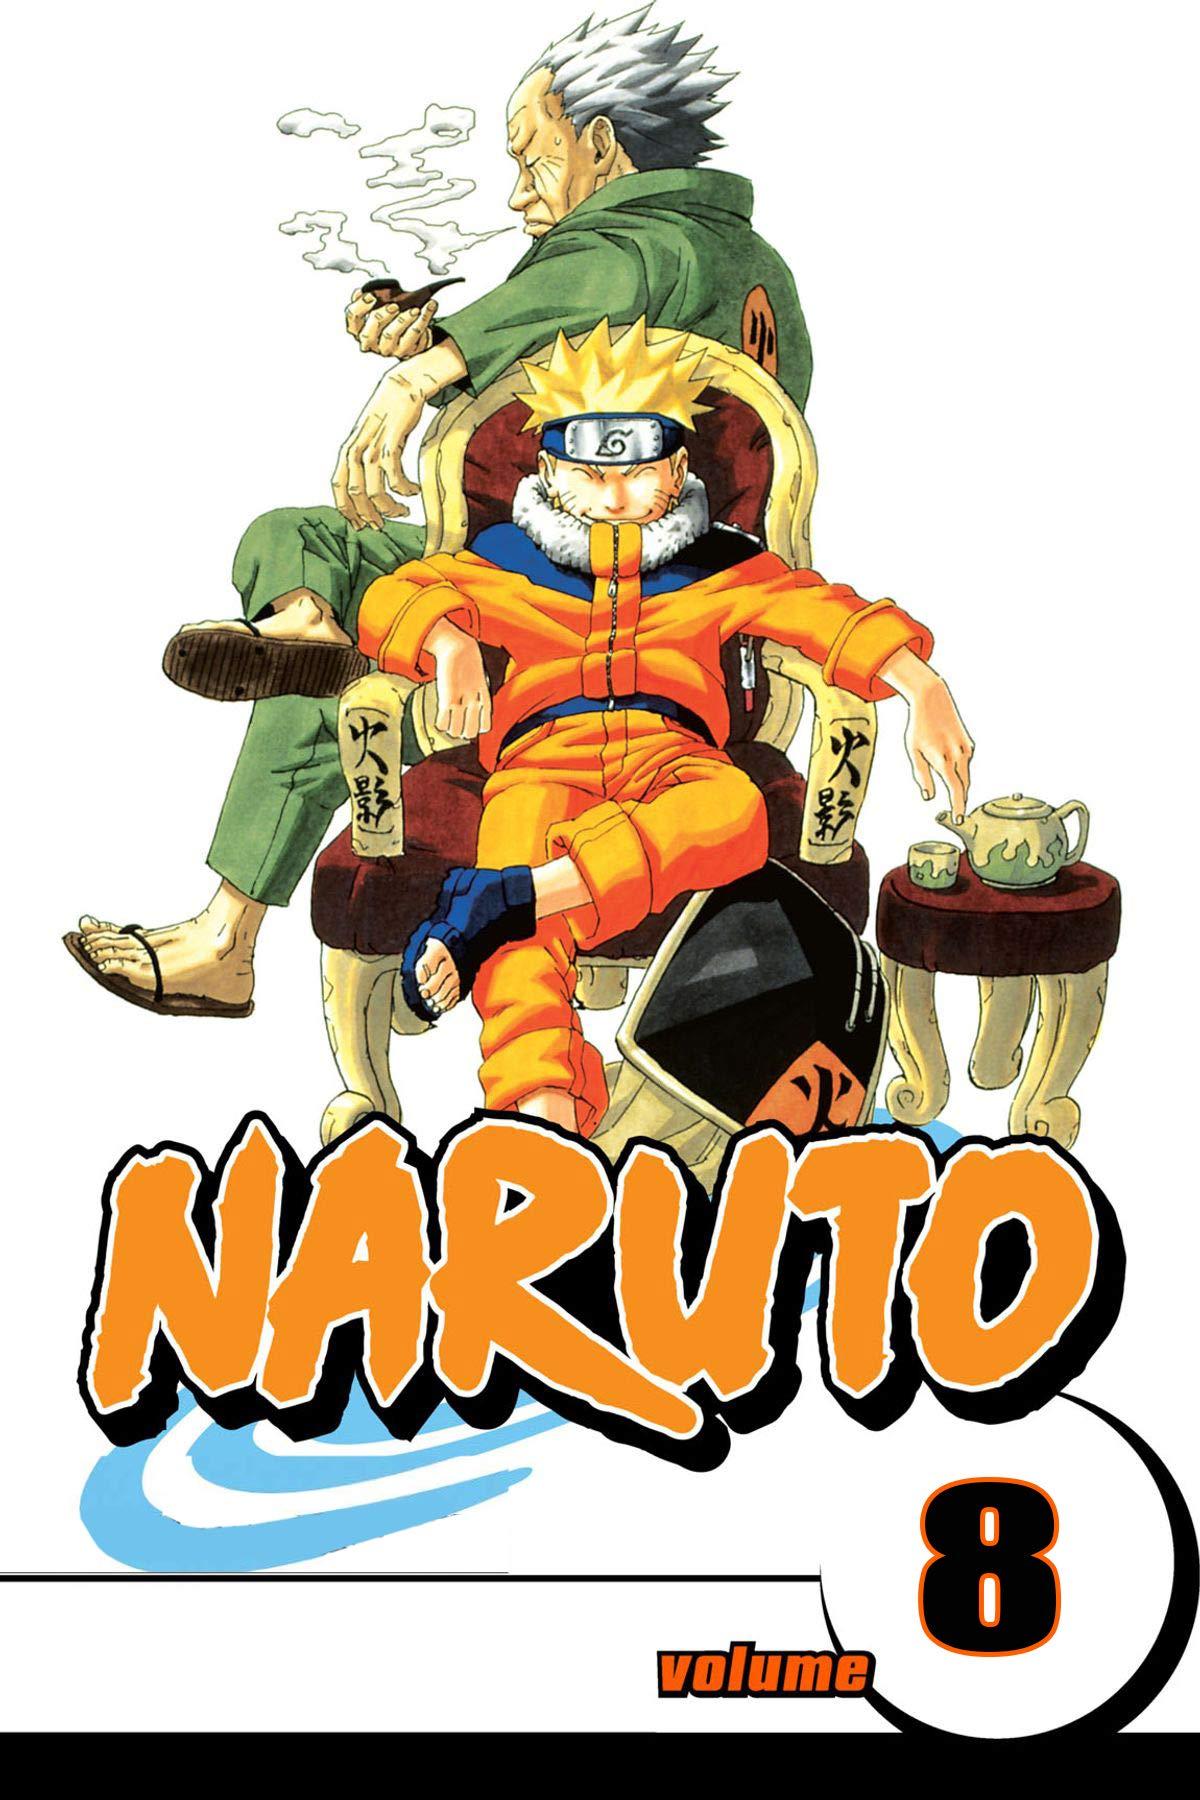 Full-Color Manga vol 8: Naruto Full